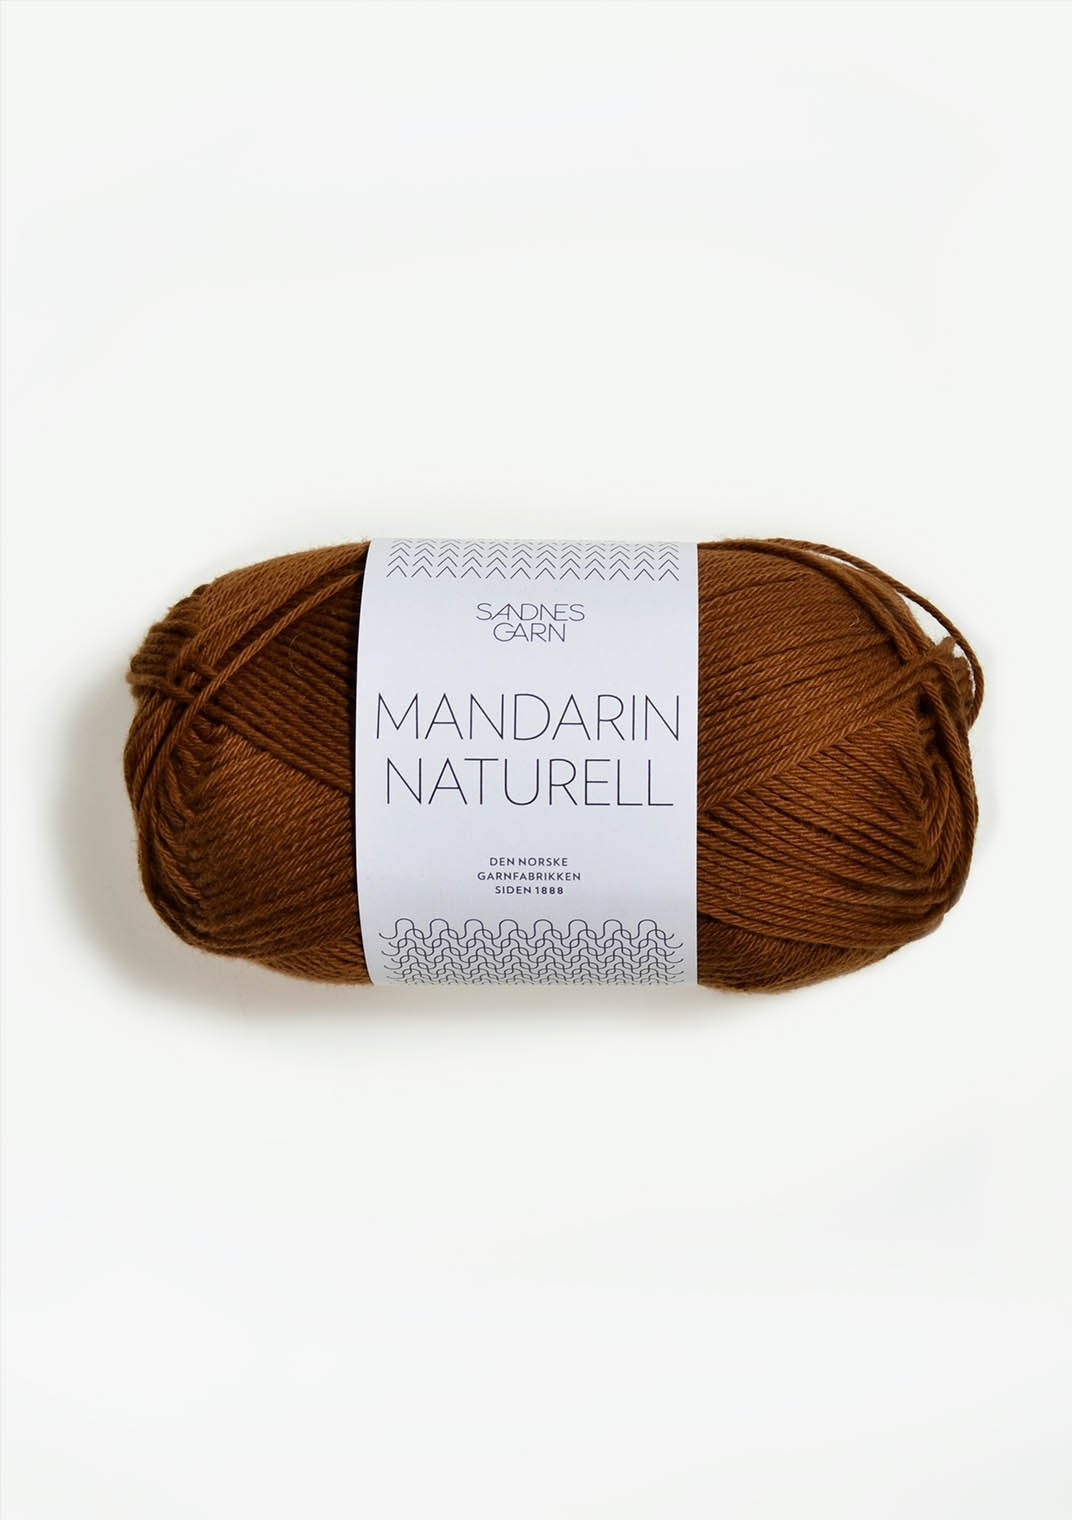 Mandarin Naturell, Sandnes Garn